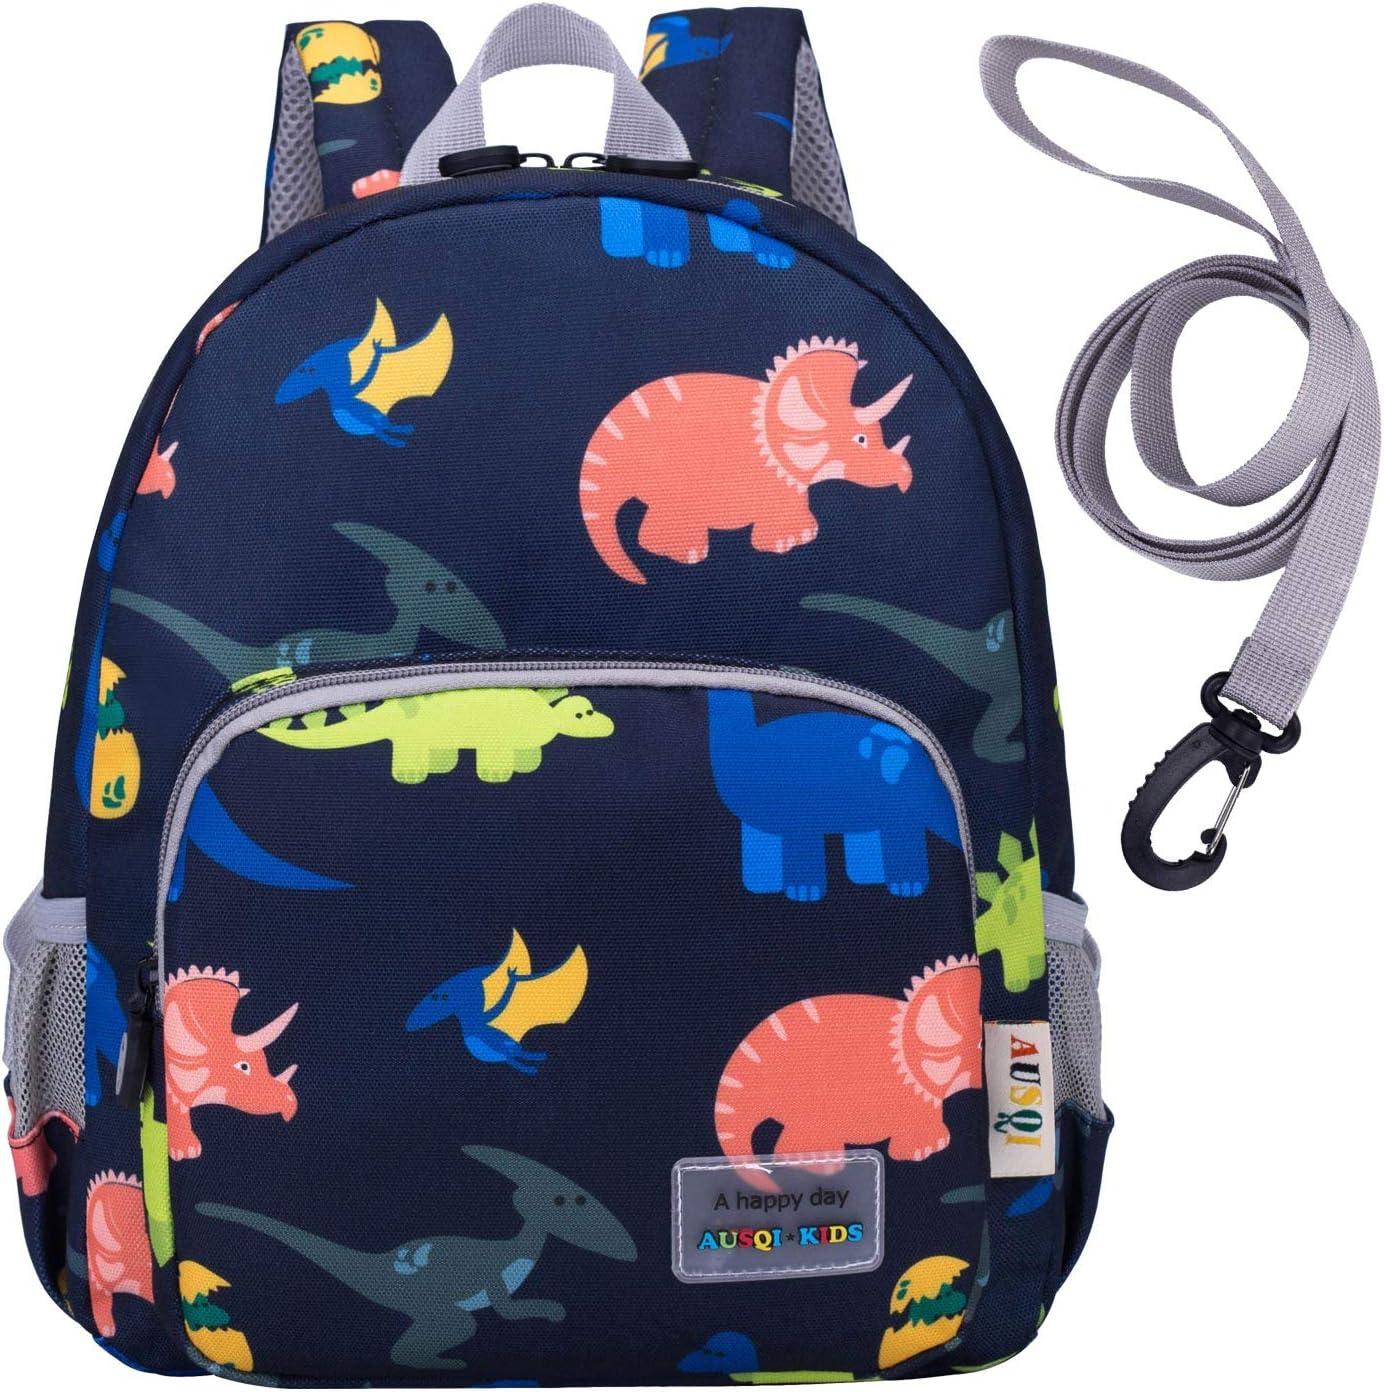 willikiva 3D Dinosaur Backpack Toddler Backpacks for Boys and Girls Kids Backpack Waterproof Preschool Safety Harness Leash (Deep Blue)